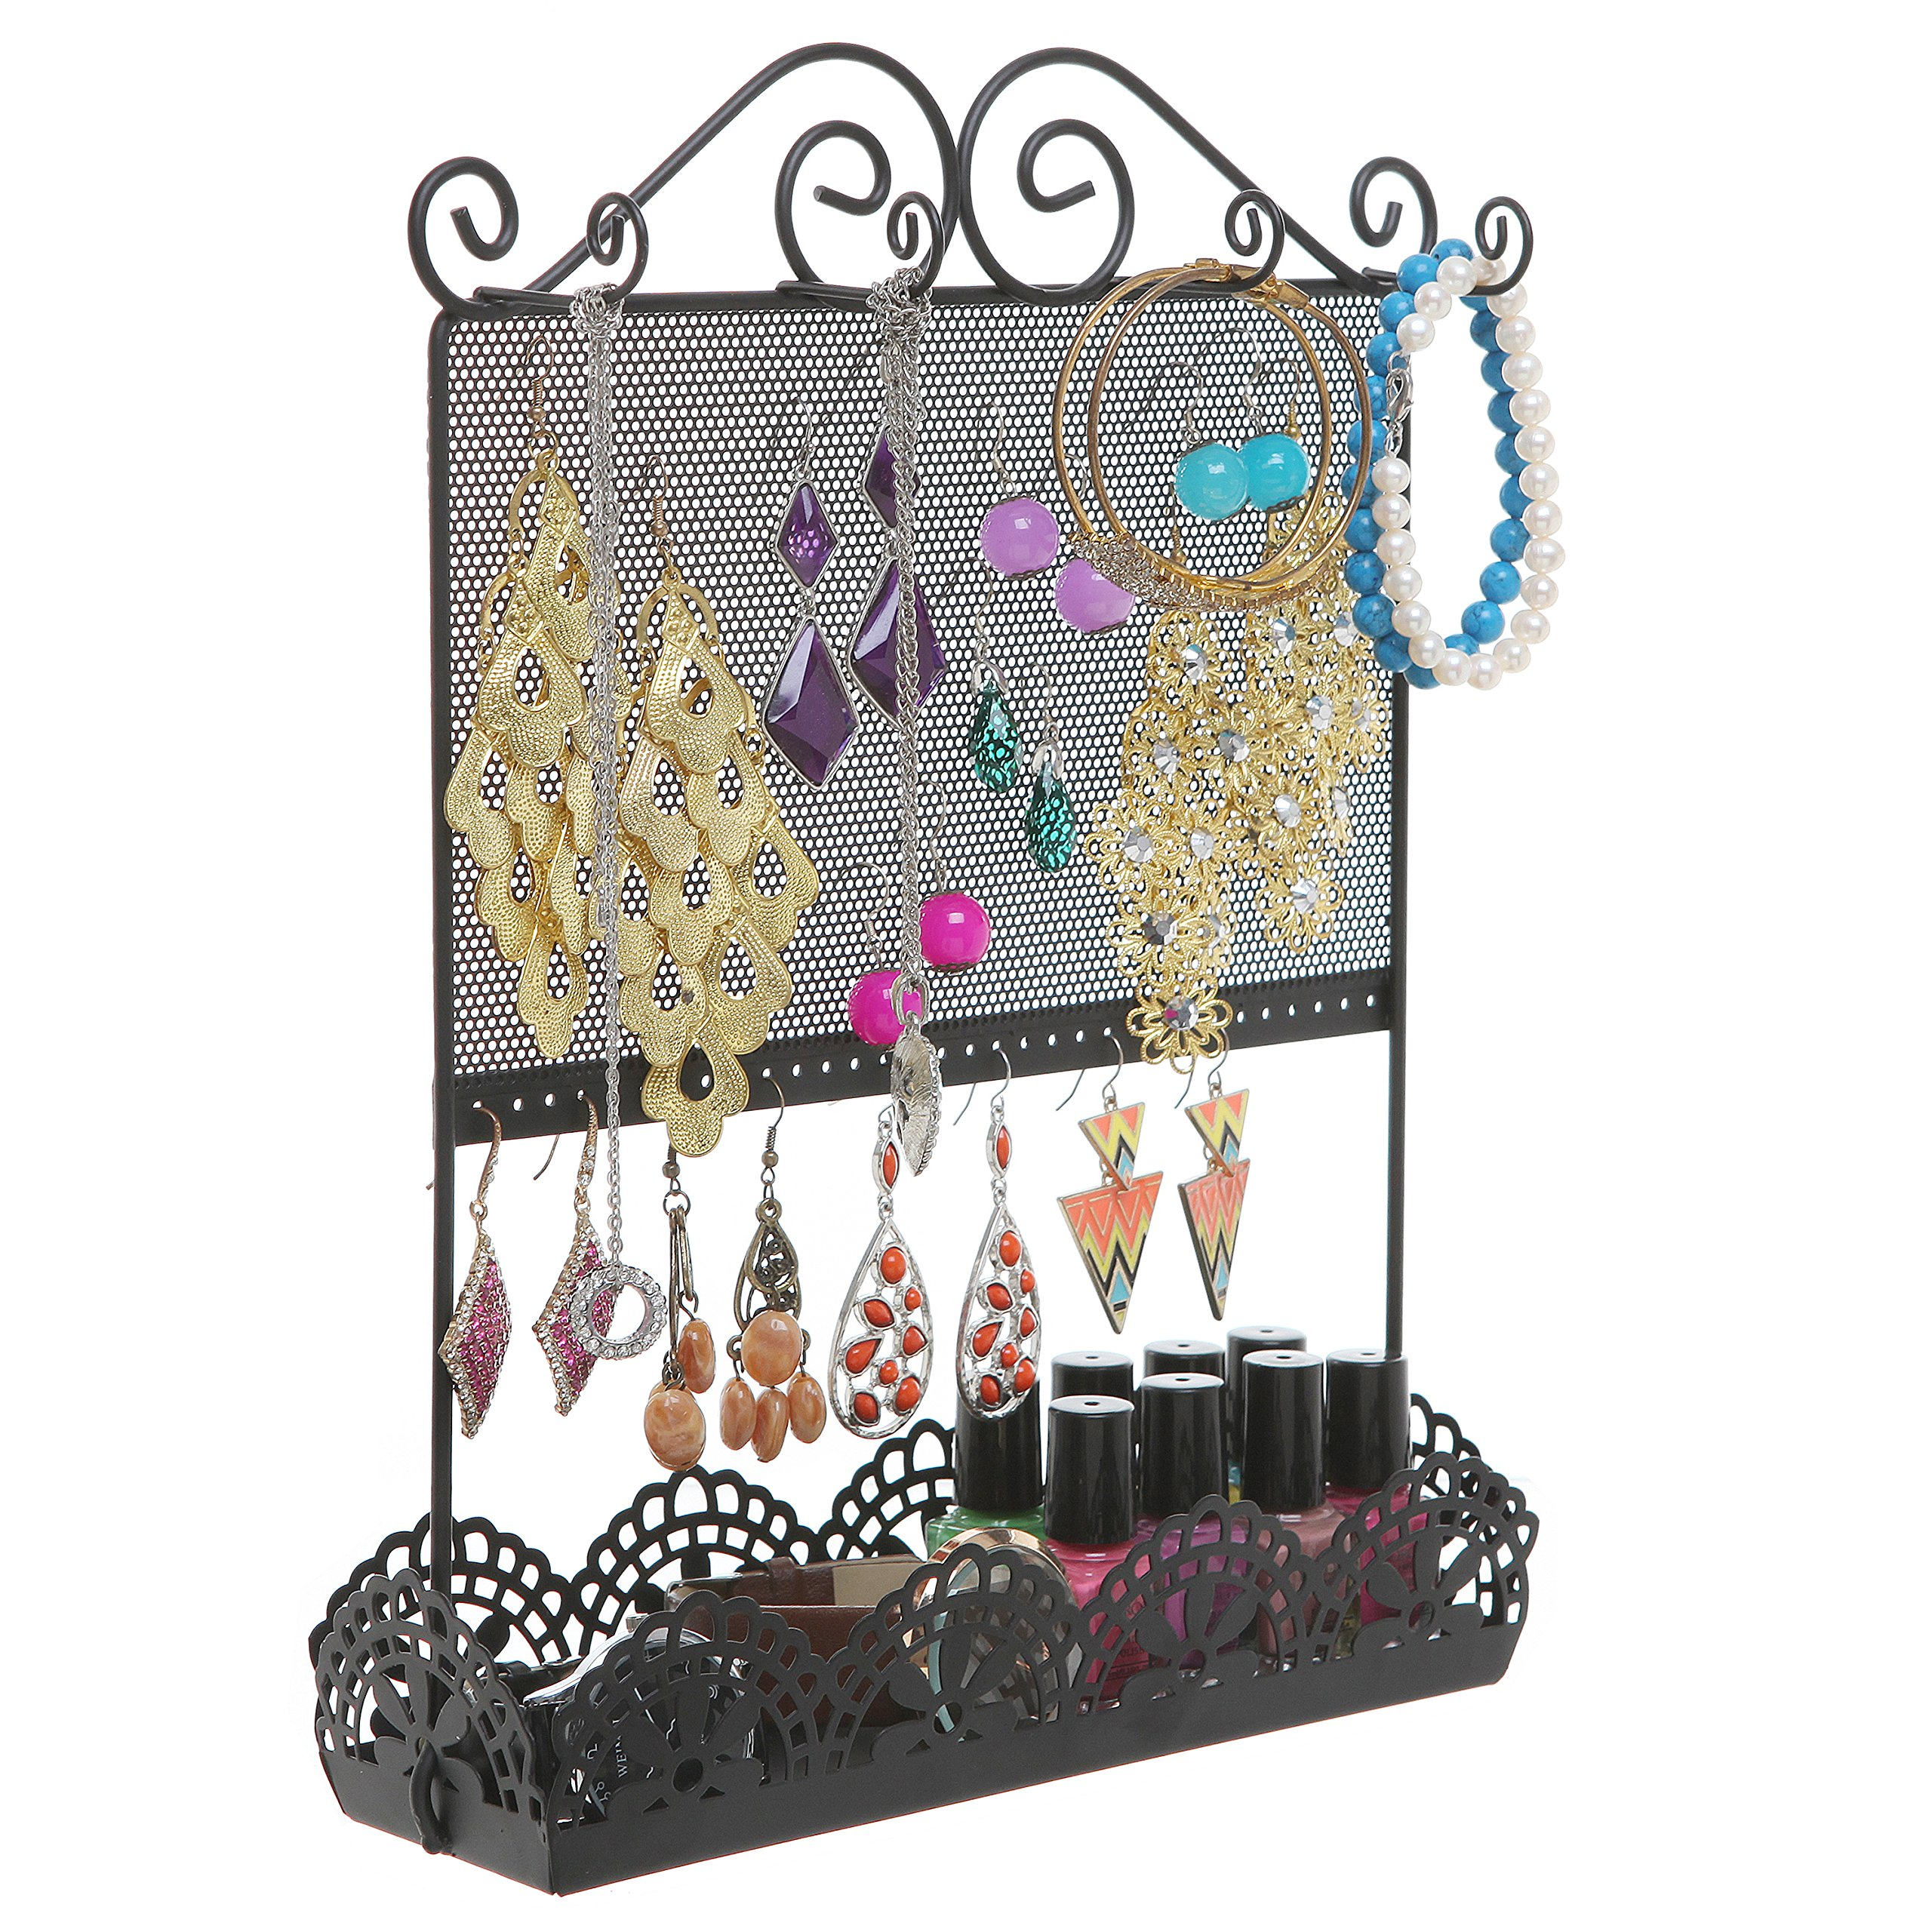 Black Metal Flower 16 pairs + Earring Holder Organizer Rack / Jewelry Makeup Storage Display Tray